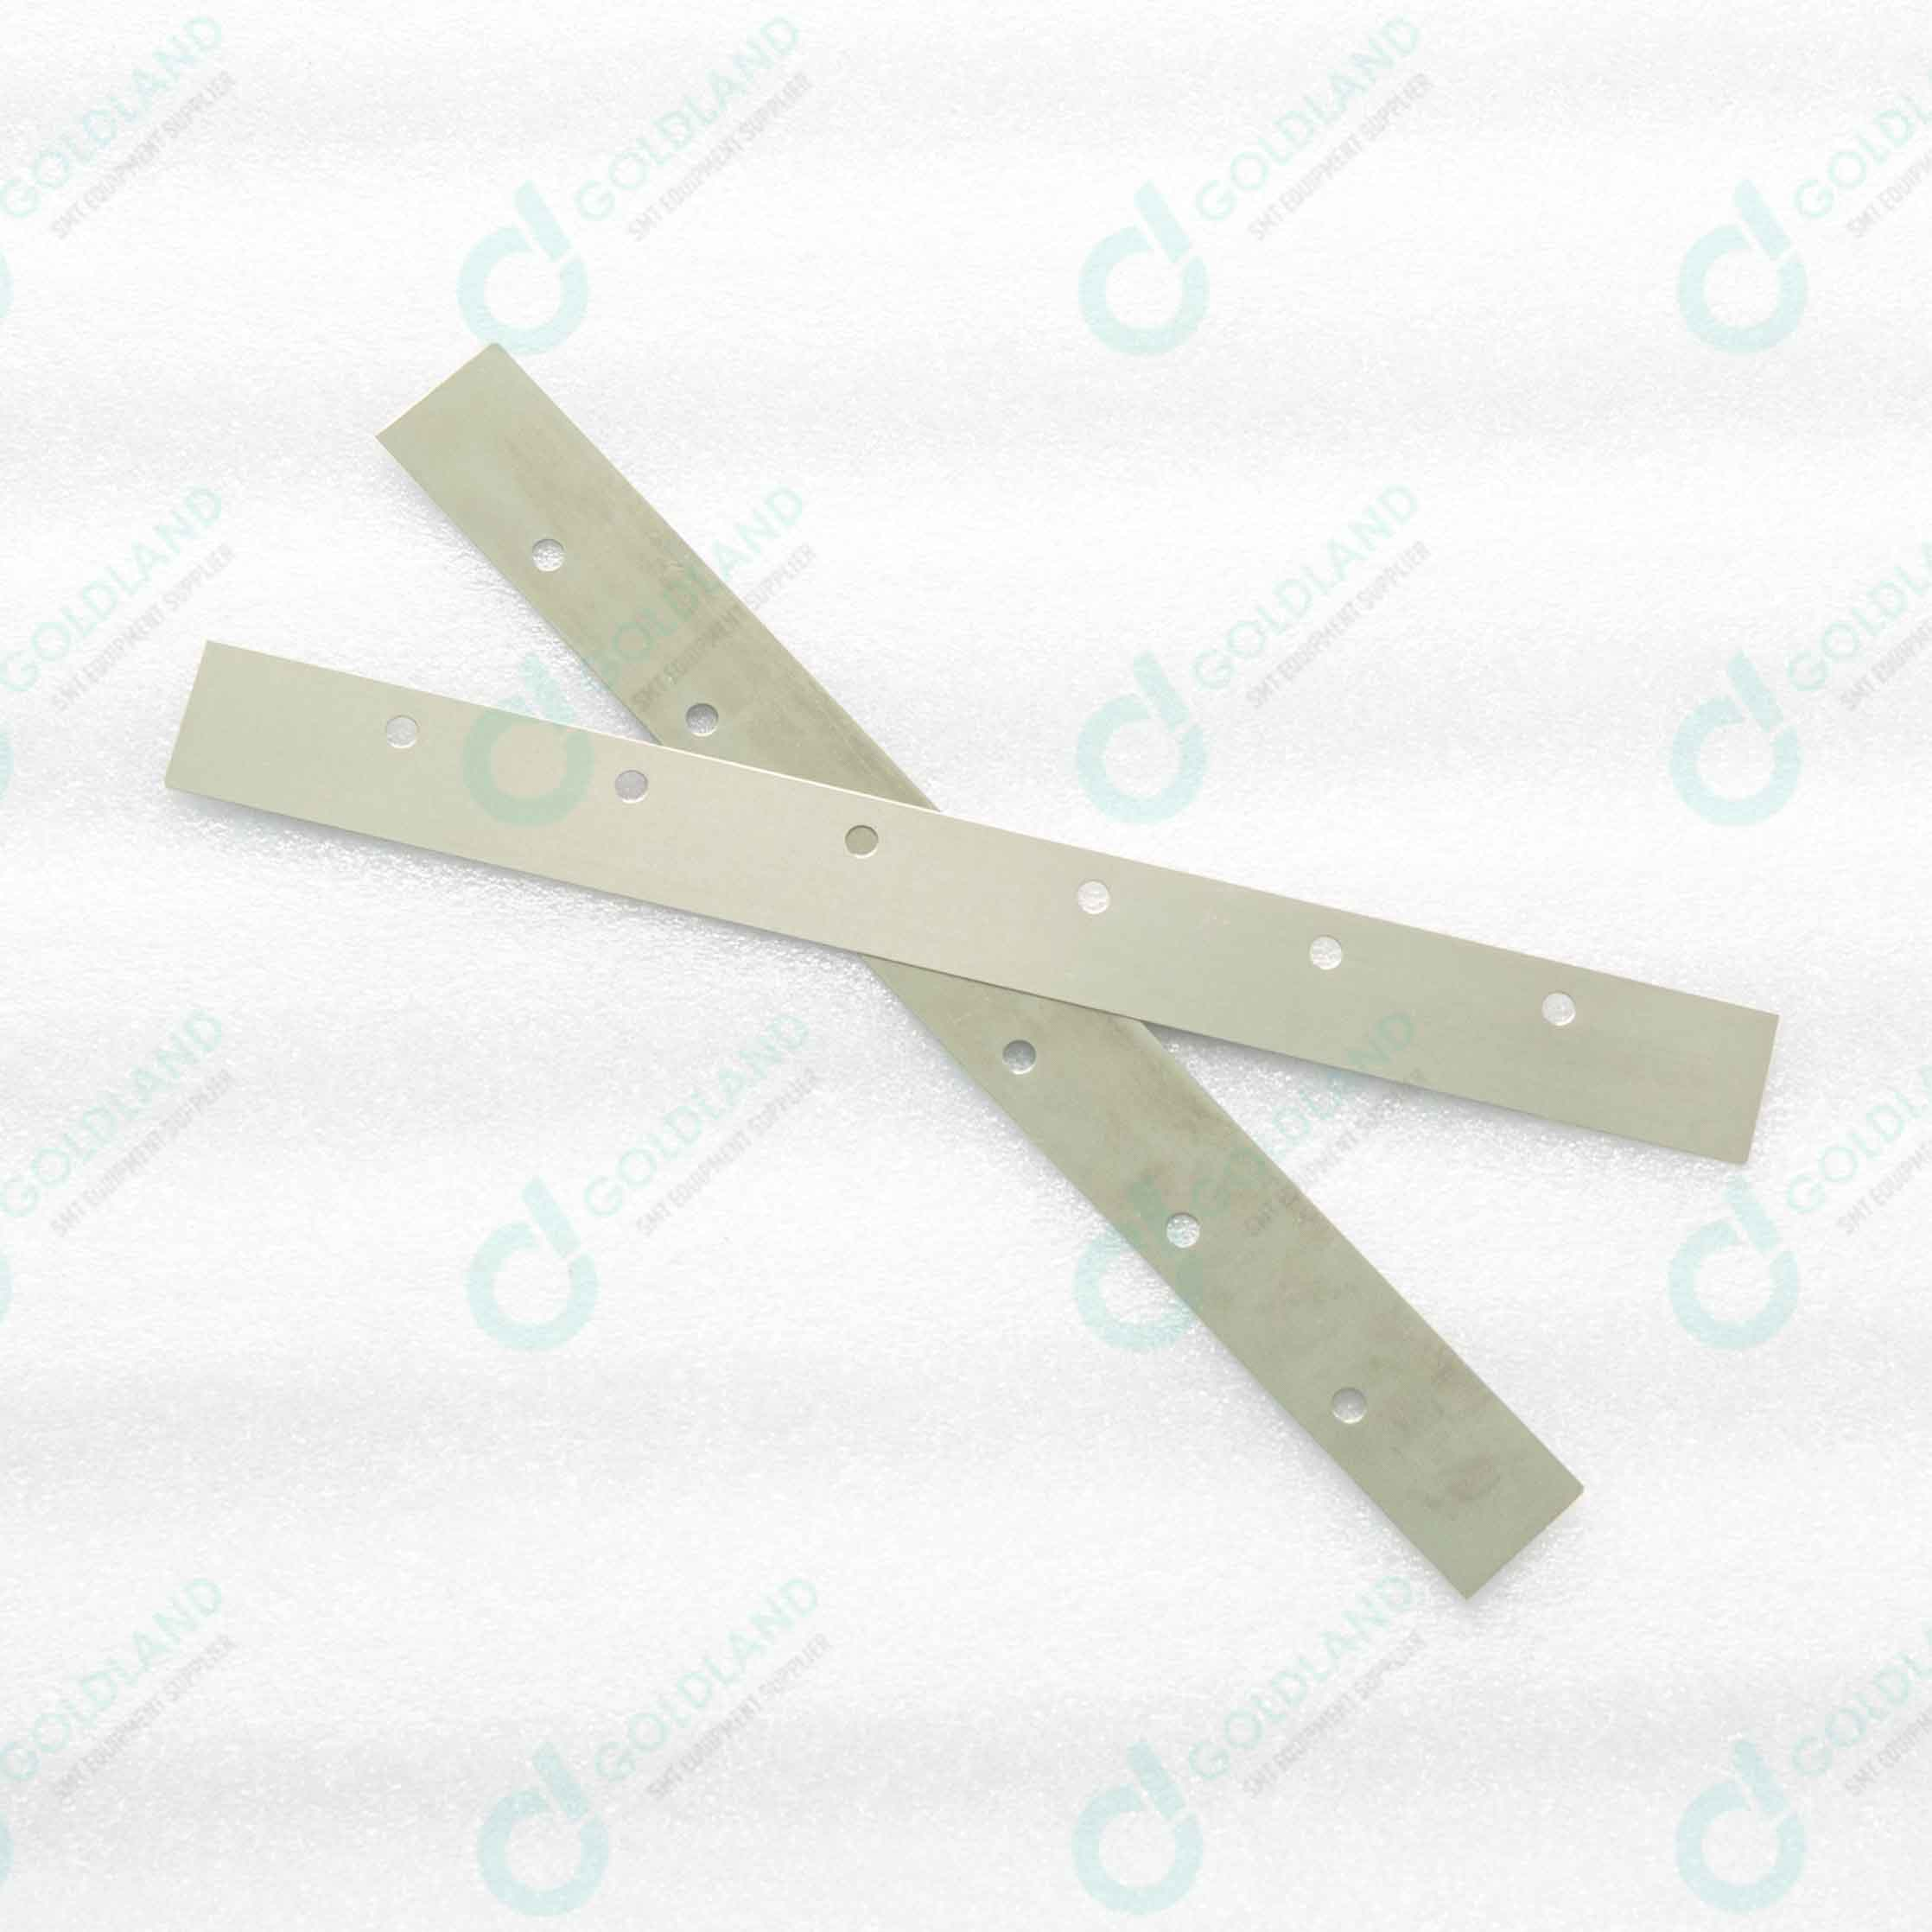 DEK ASM Squeegee Blade 300mm 45 deg for DEK SMT Printers Spare parts